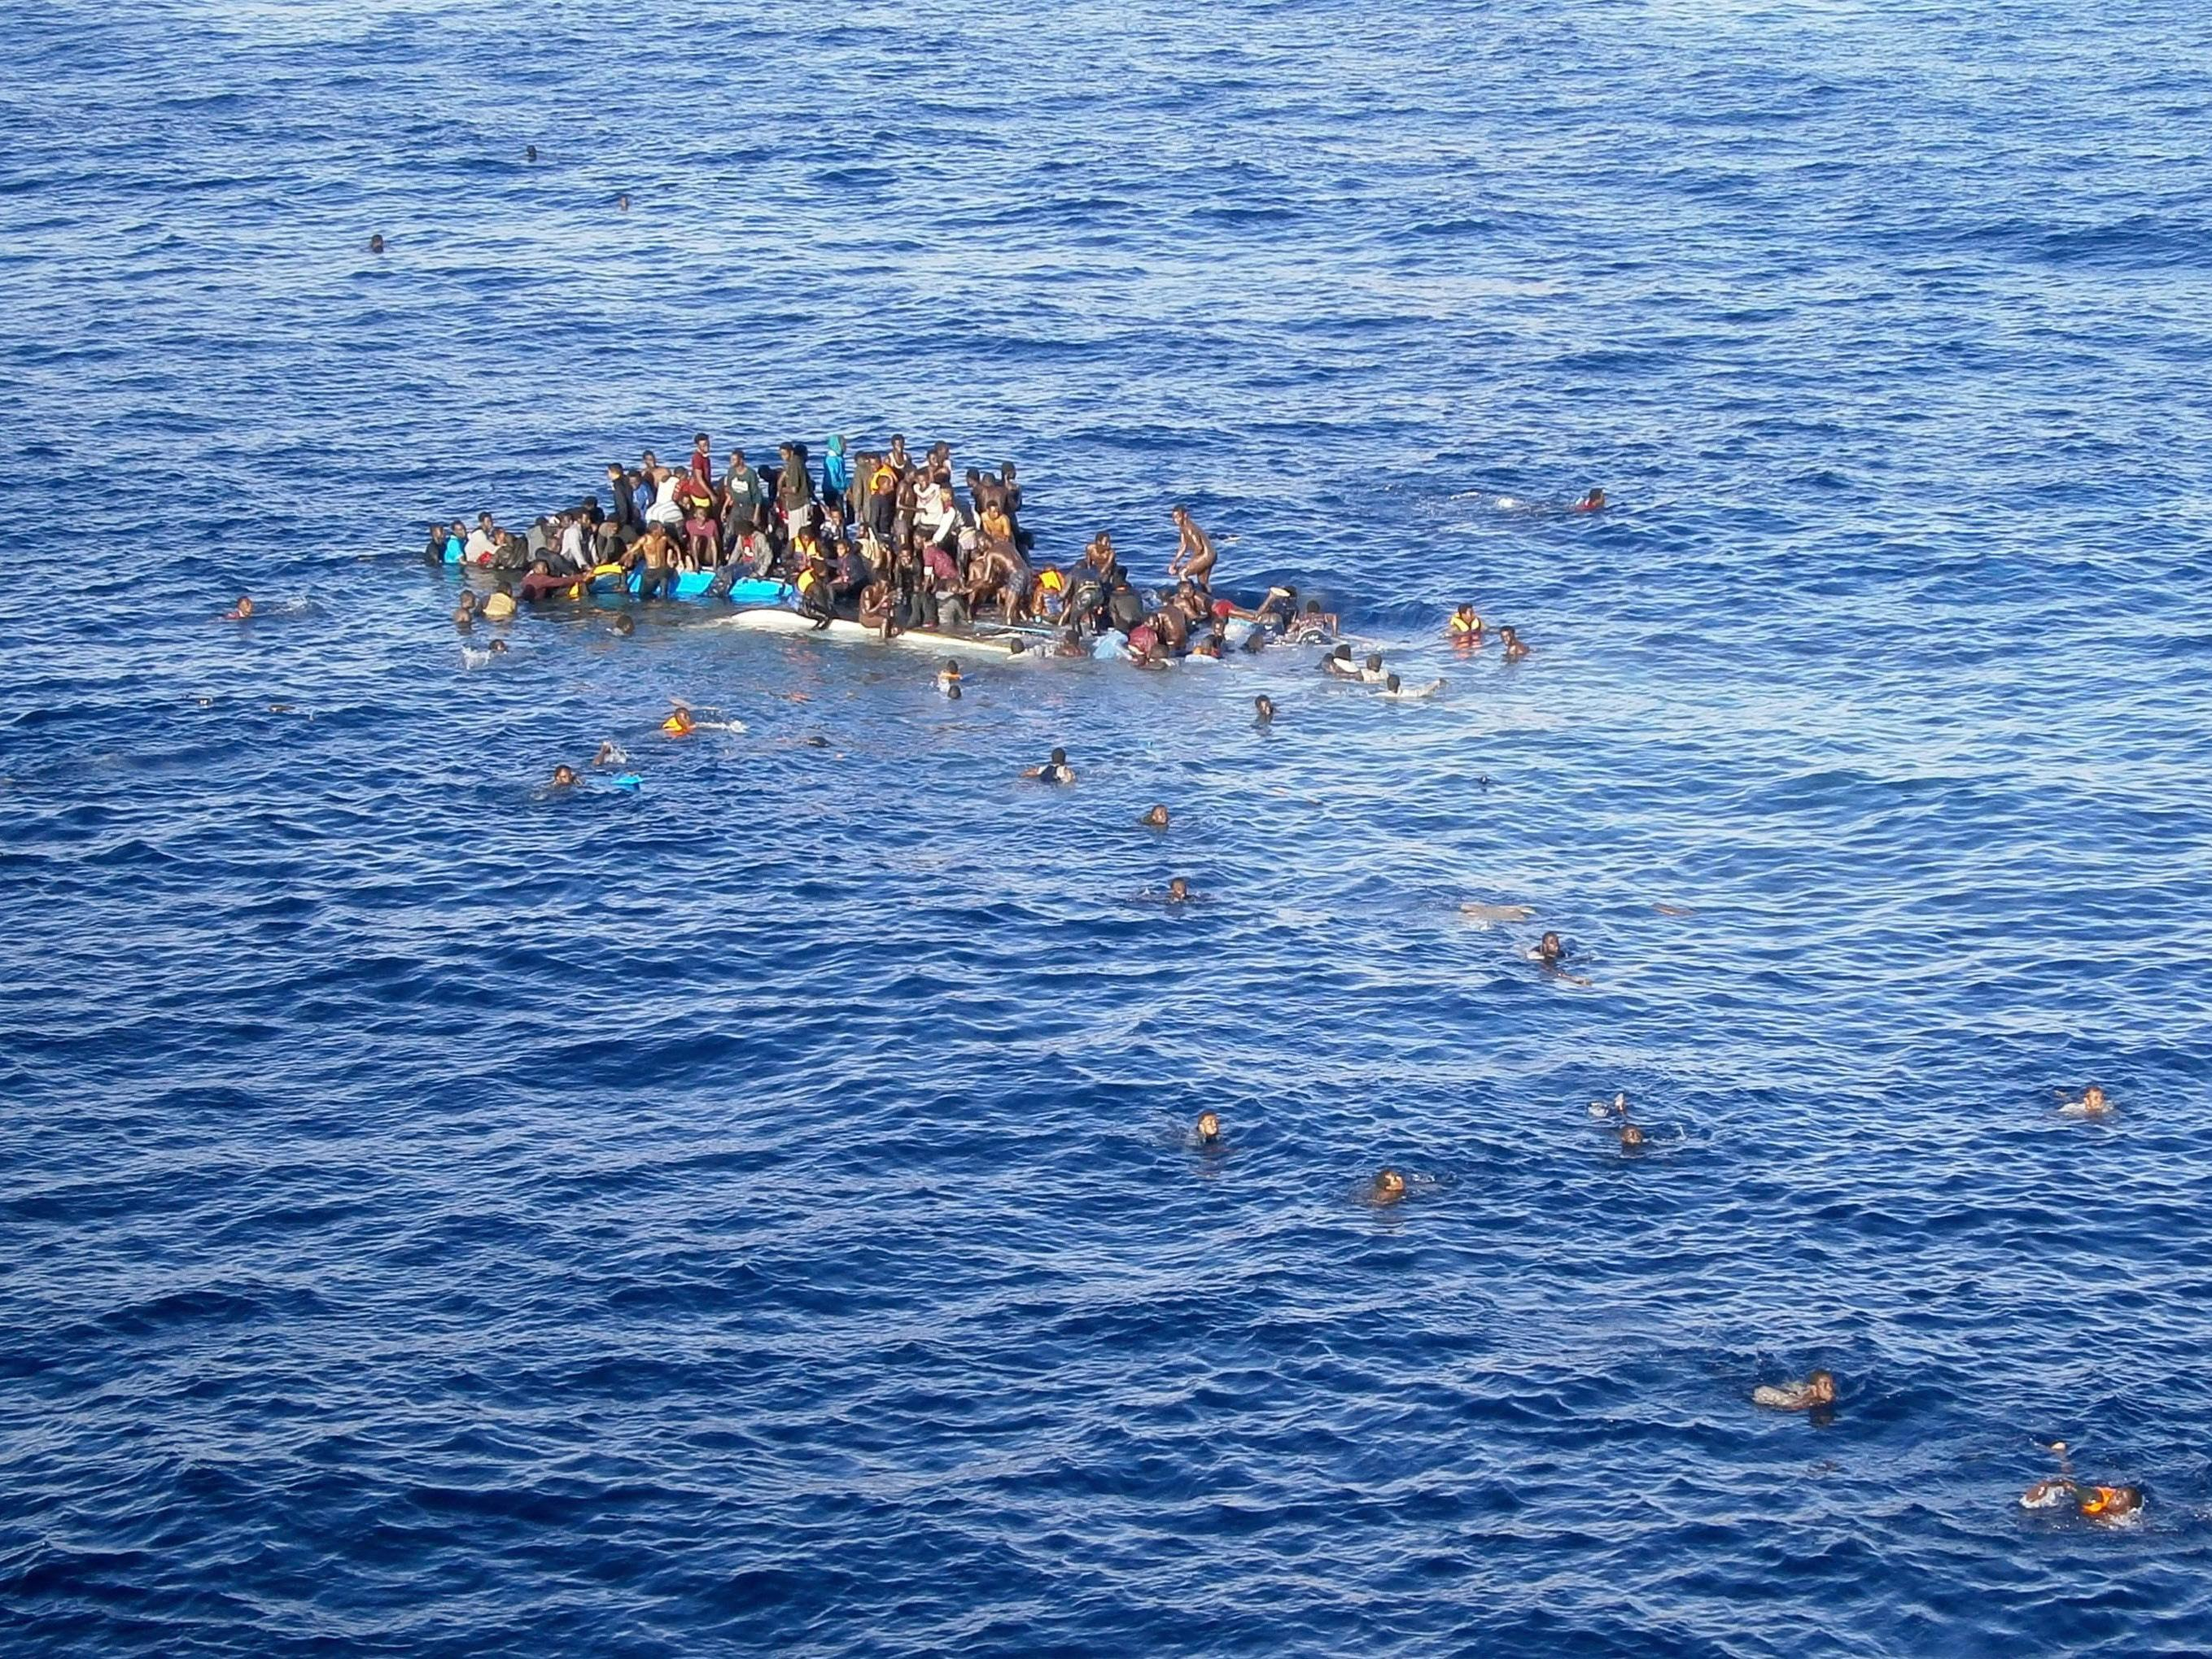 Ein völlig überladenes Flüchtlingsboot sinkt im Mittelmeer am 12. April 2015.